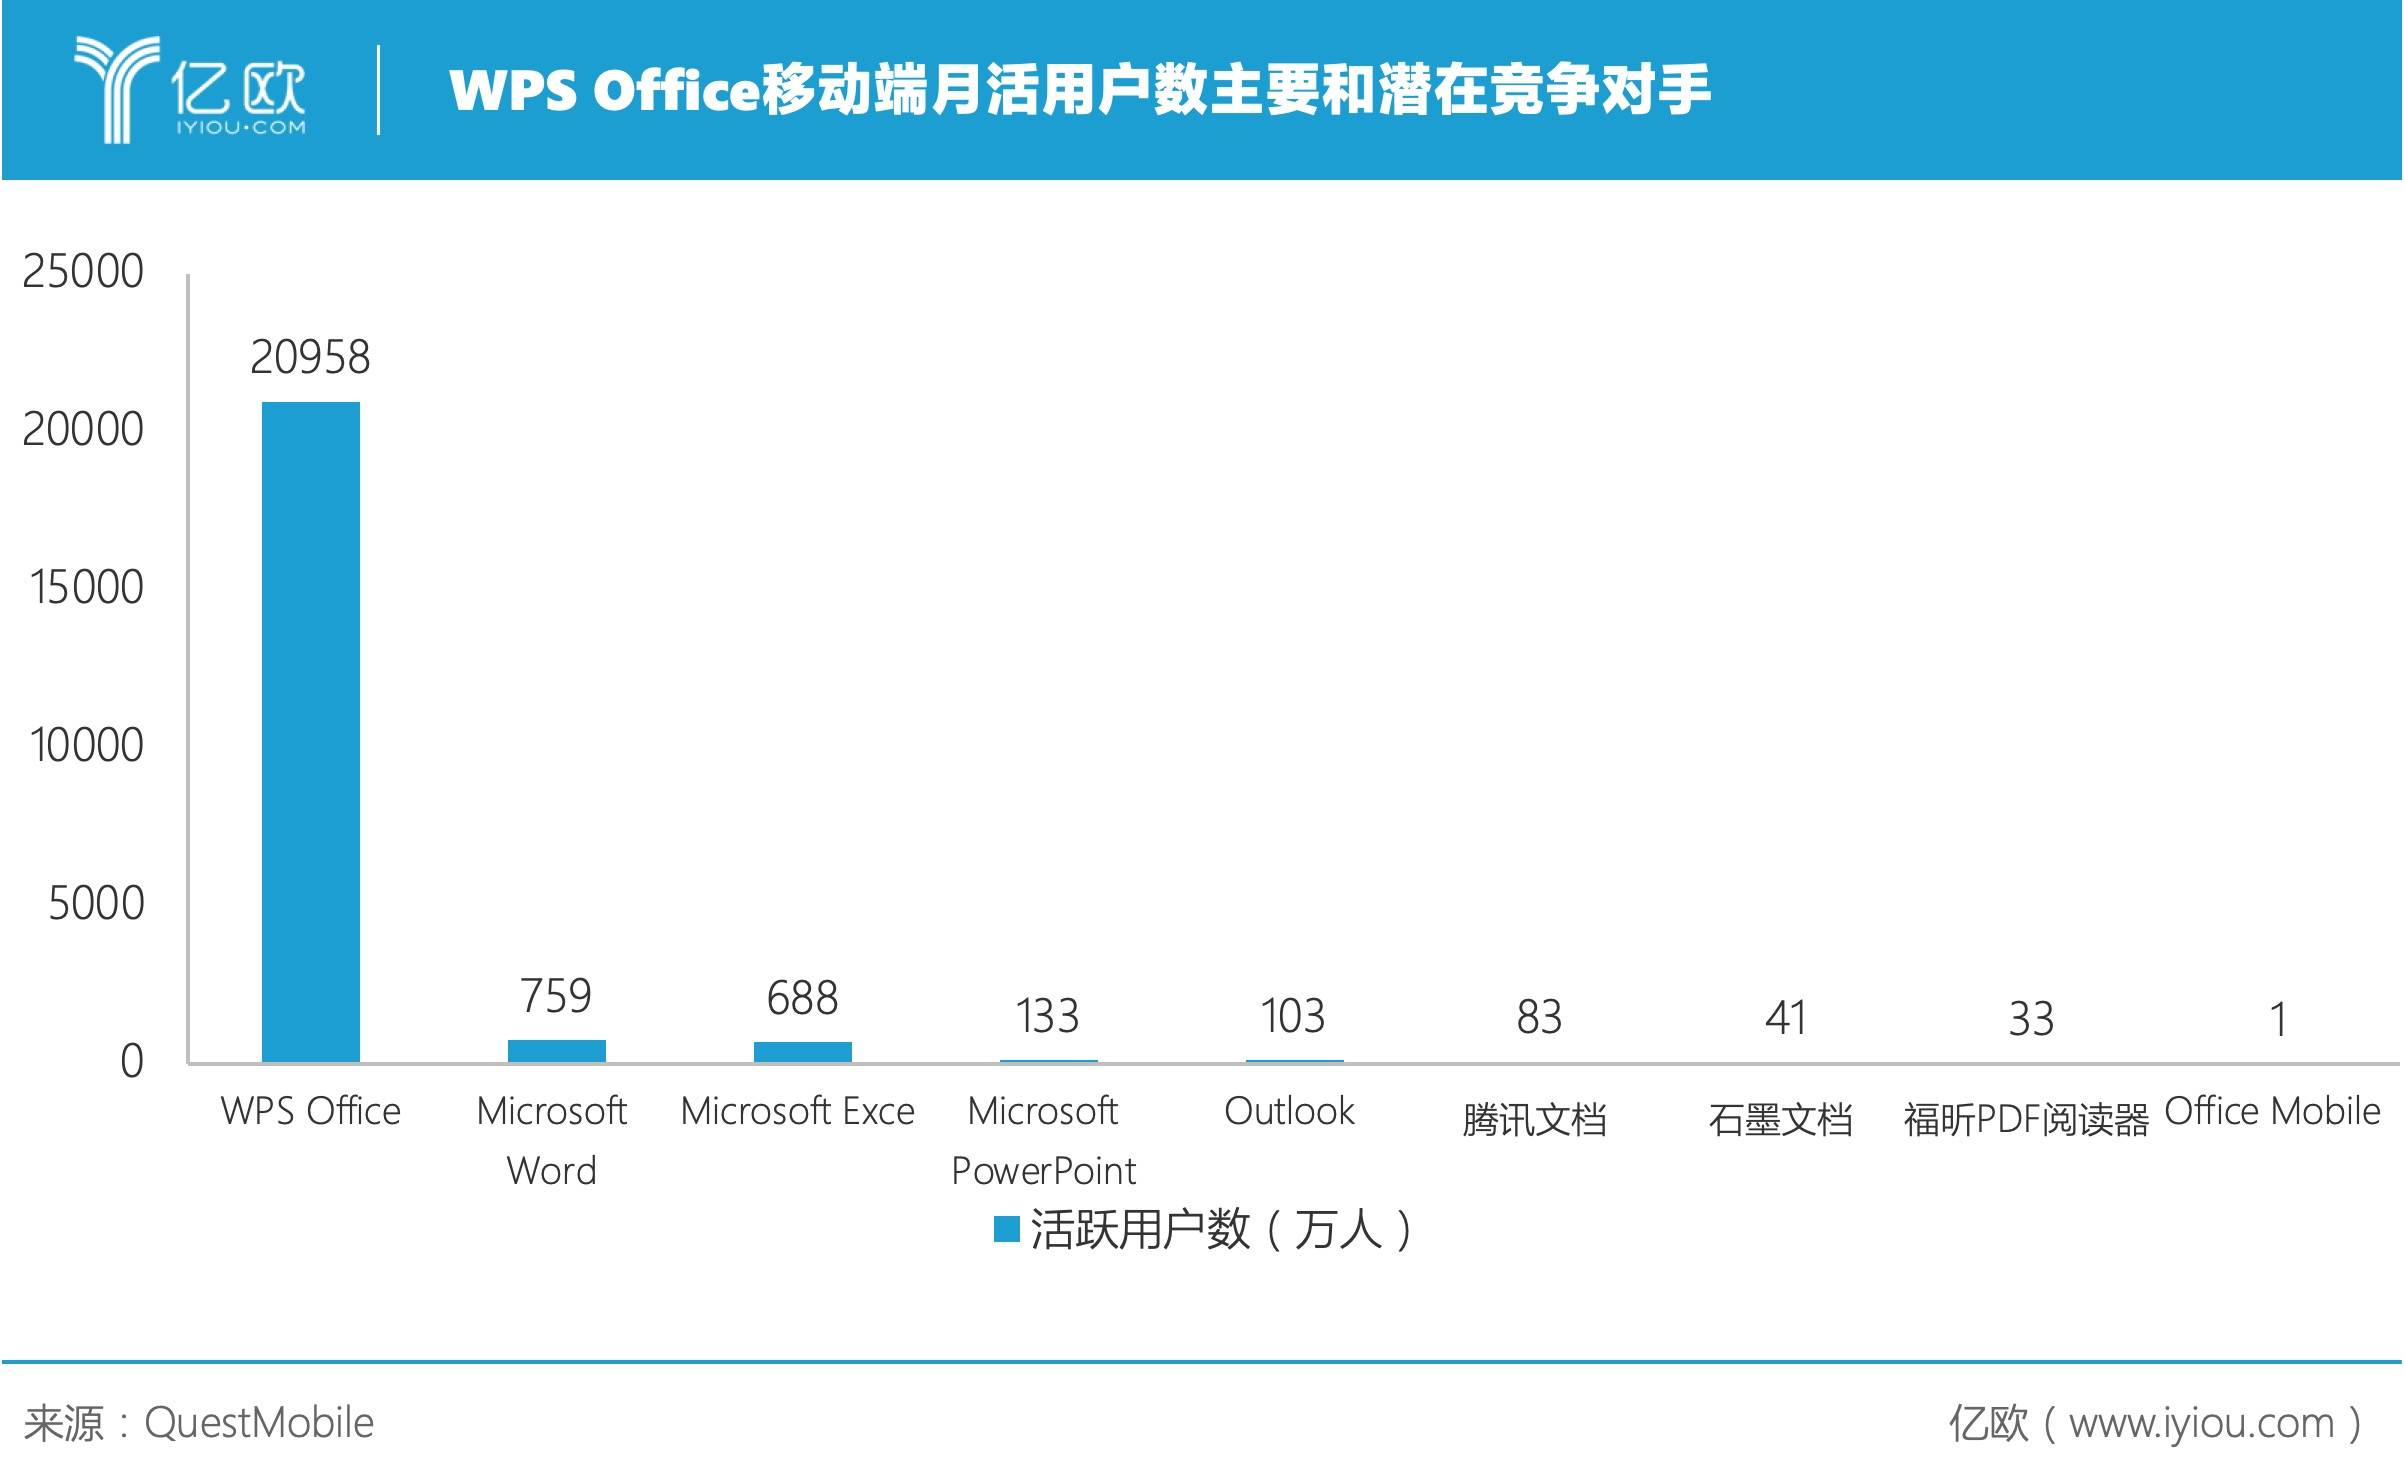 WPS Office移动端月活用户数主要和潜在竞争对手.jpeg